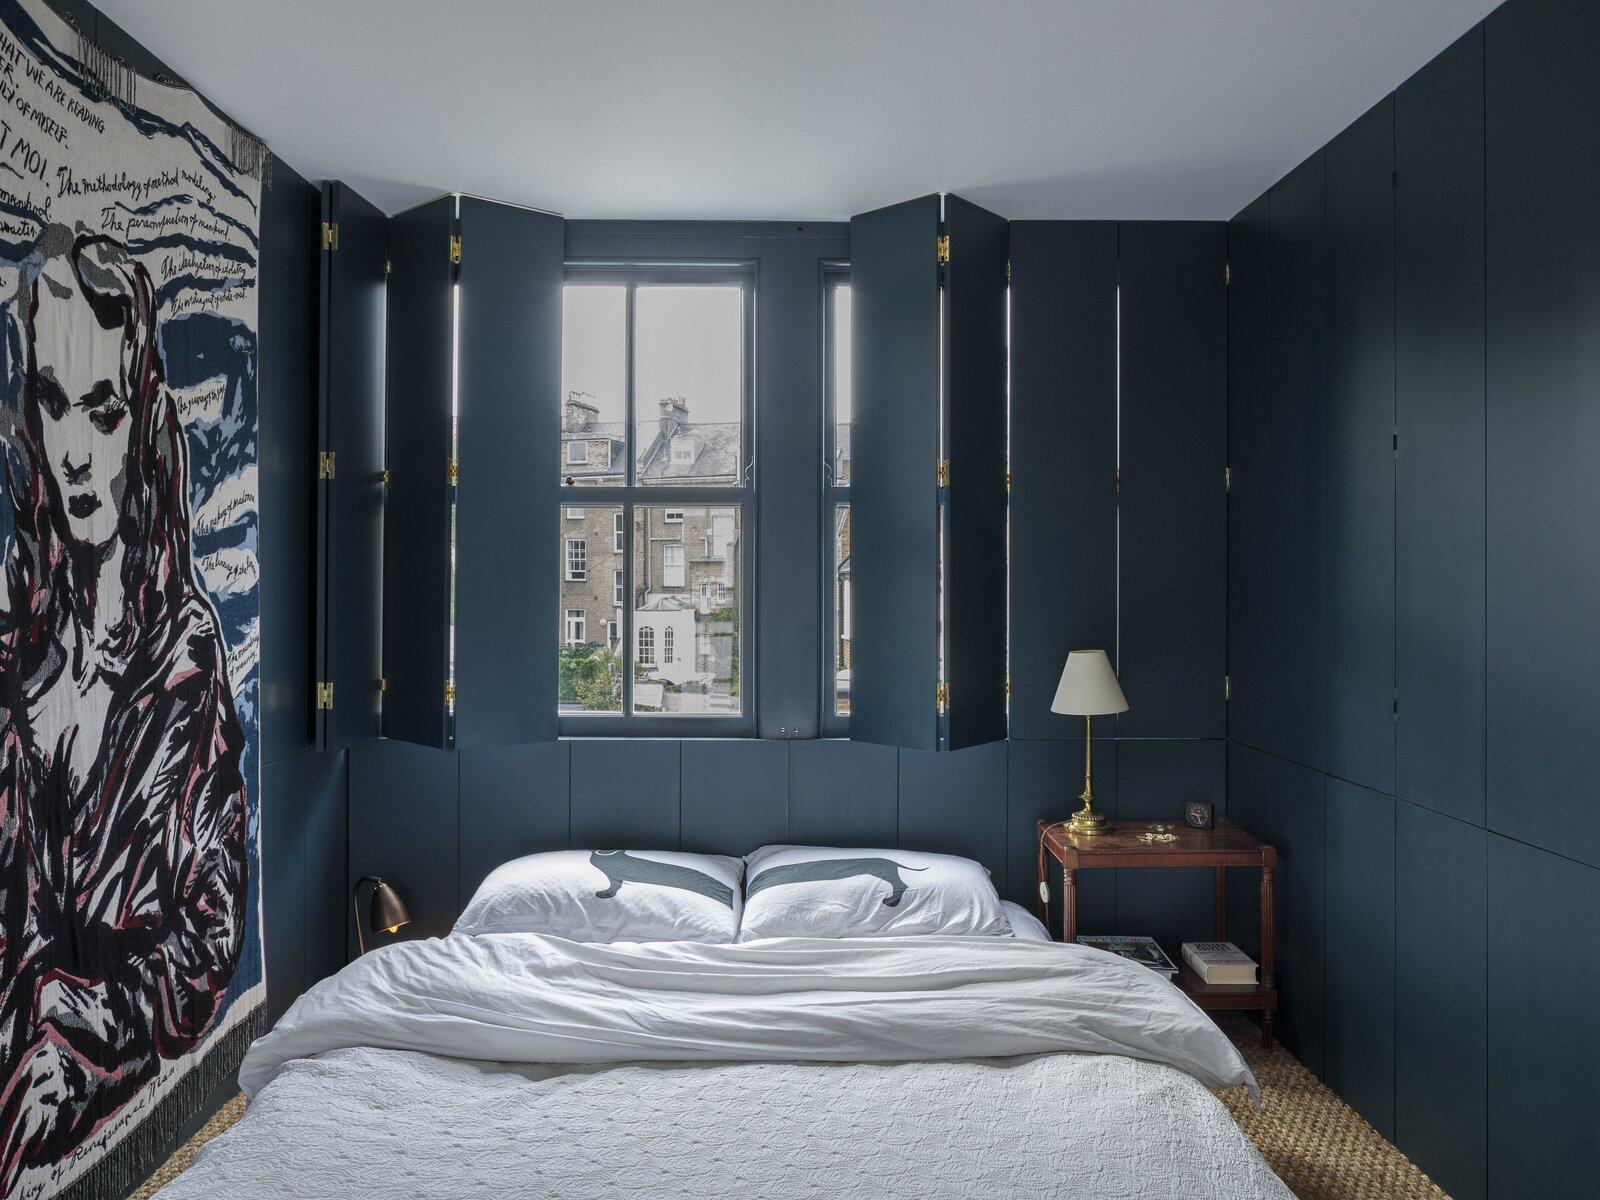 Bedroom, Carpet Floor, Wardrobe, and Bed Master bedroom on the third floor  Primrose Hill